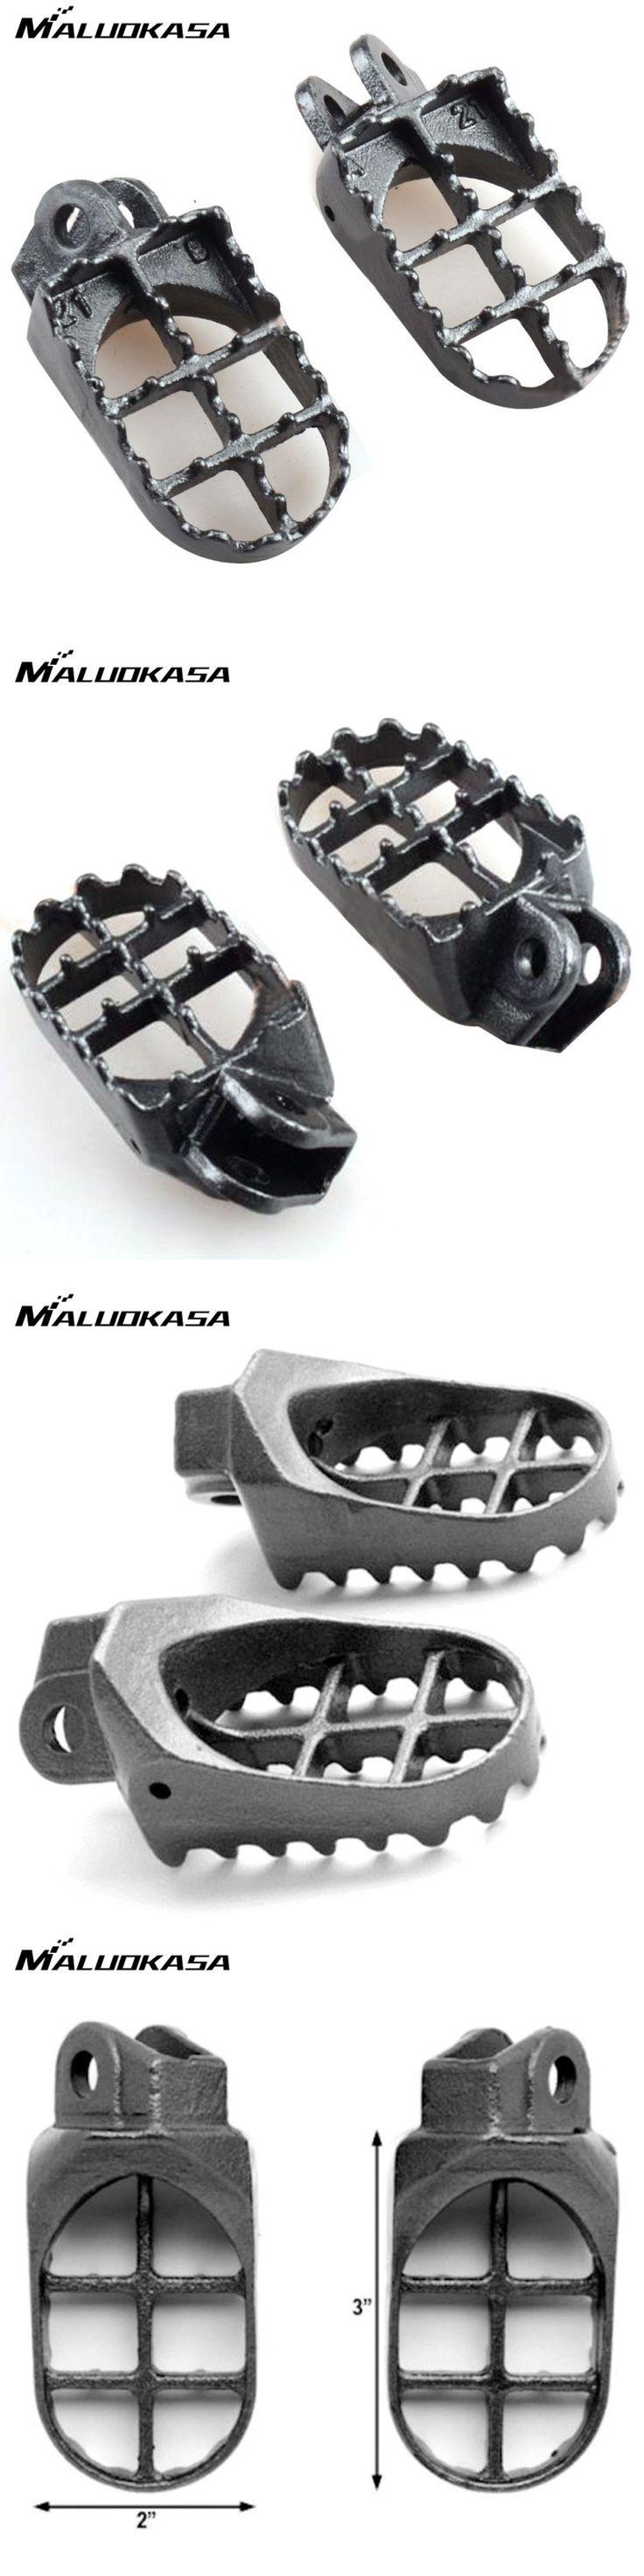 MALUOKASA Motocross Foot Pegs Pedal Footrest For Kawasaki KLX400 KX500 For Suzuki DRZ400/RM125 250 DR-Z 400E 400S 2000-07 Auto